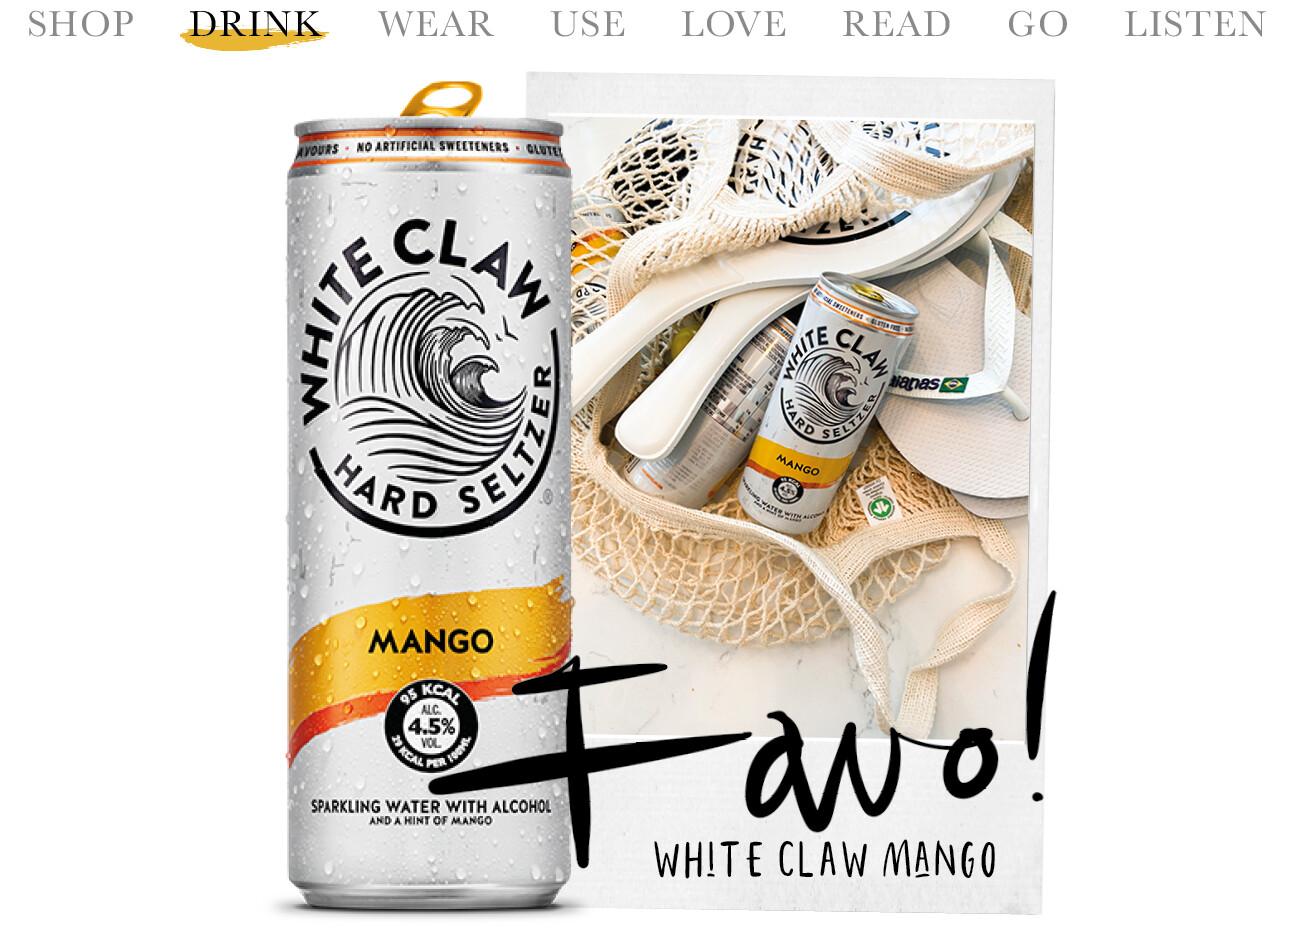 Today we drink whiteclaw mango